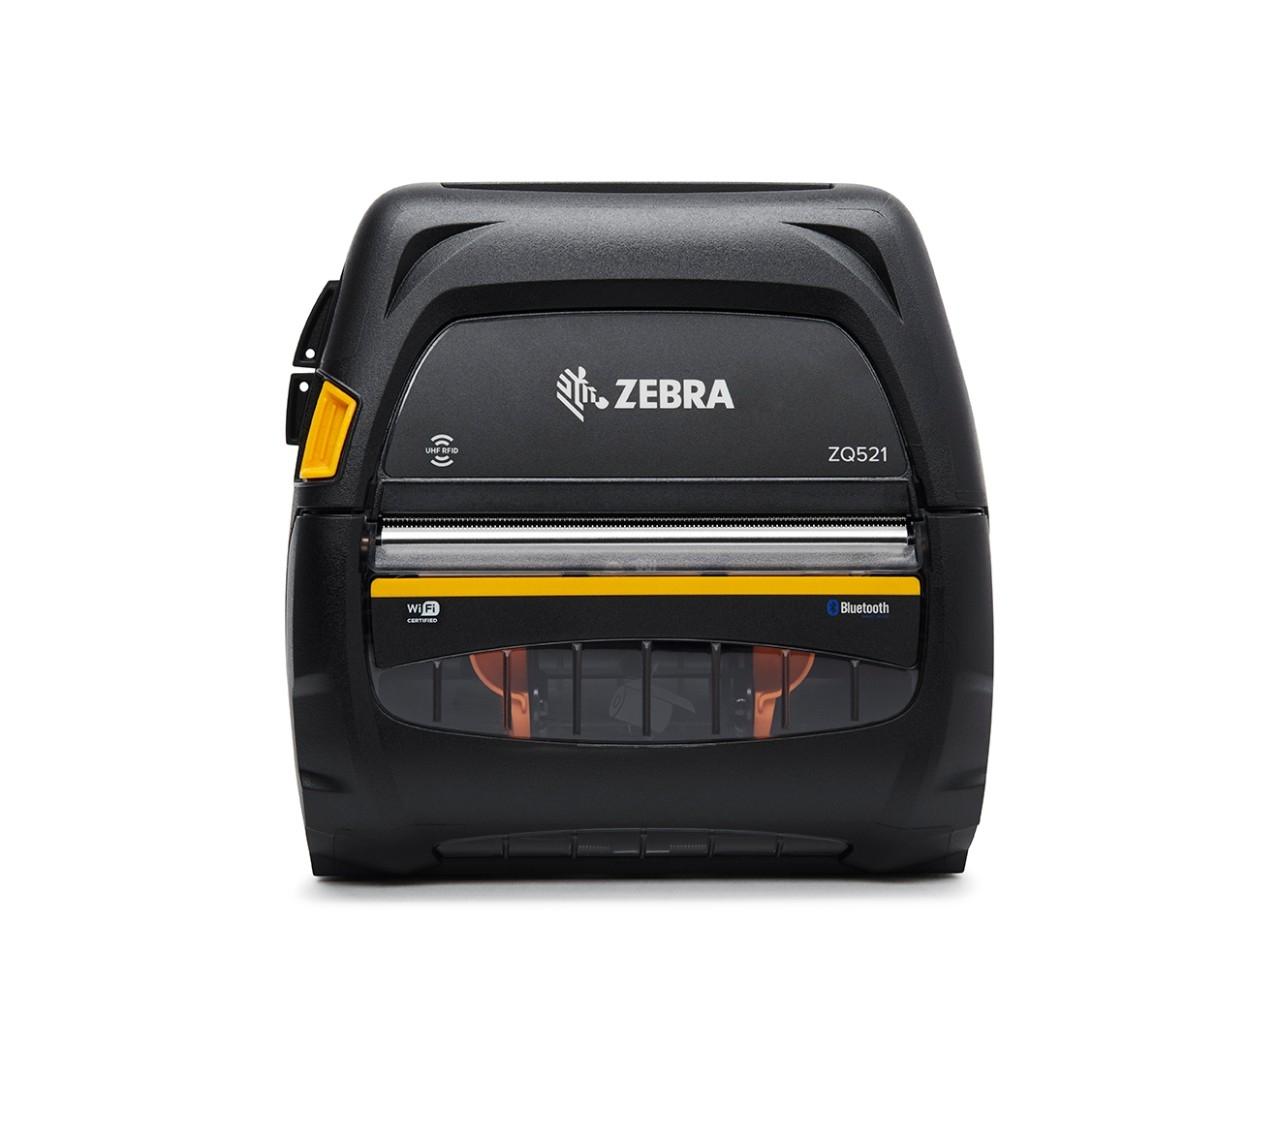 Impresora móvil RFID ZQ521